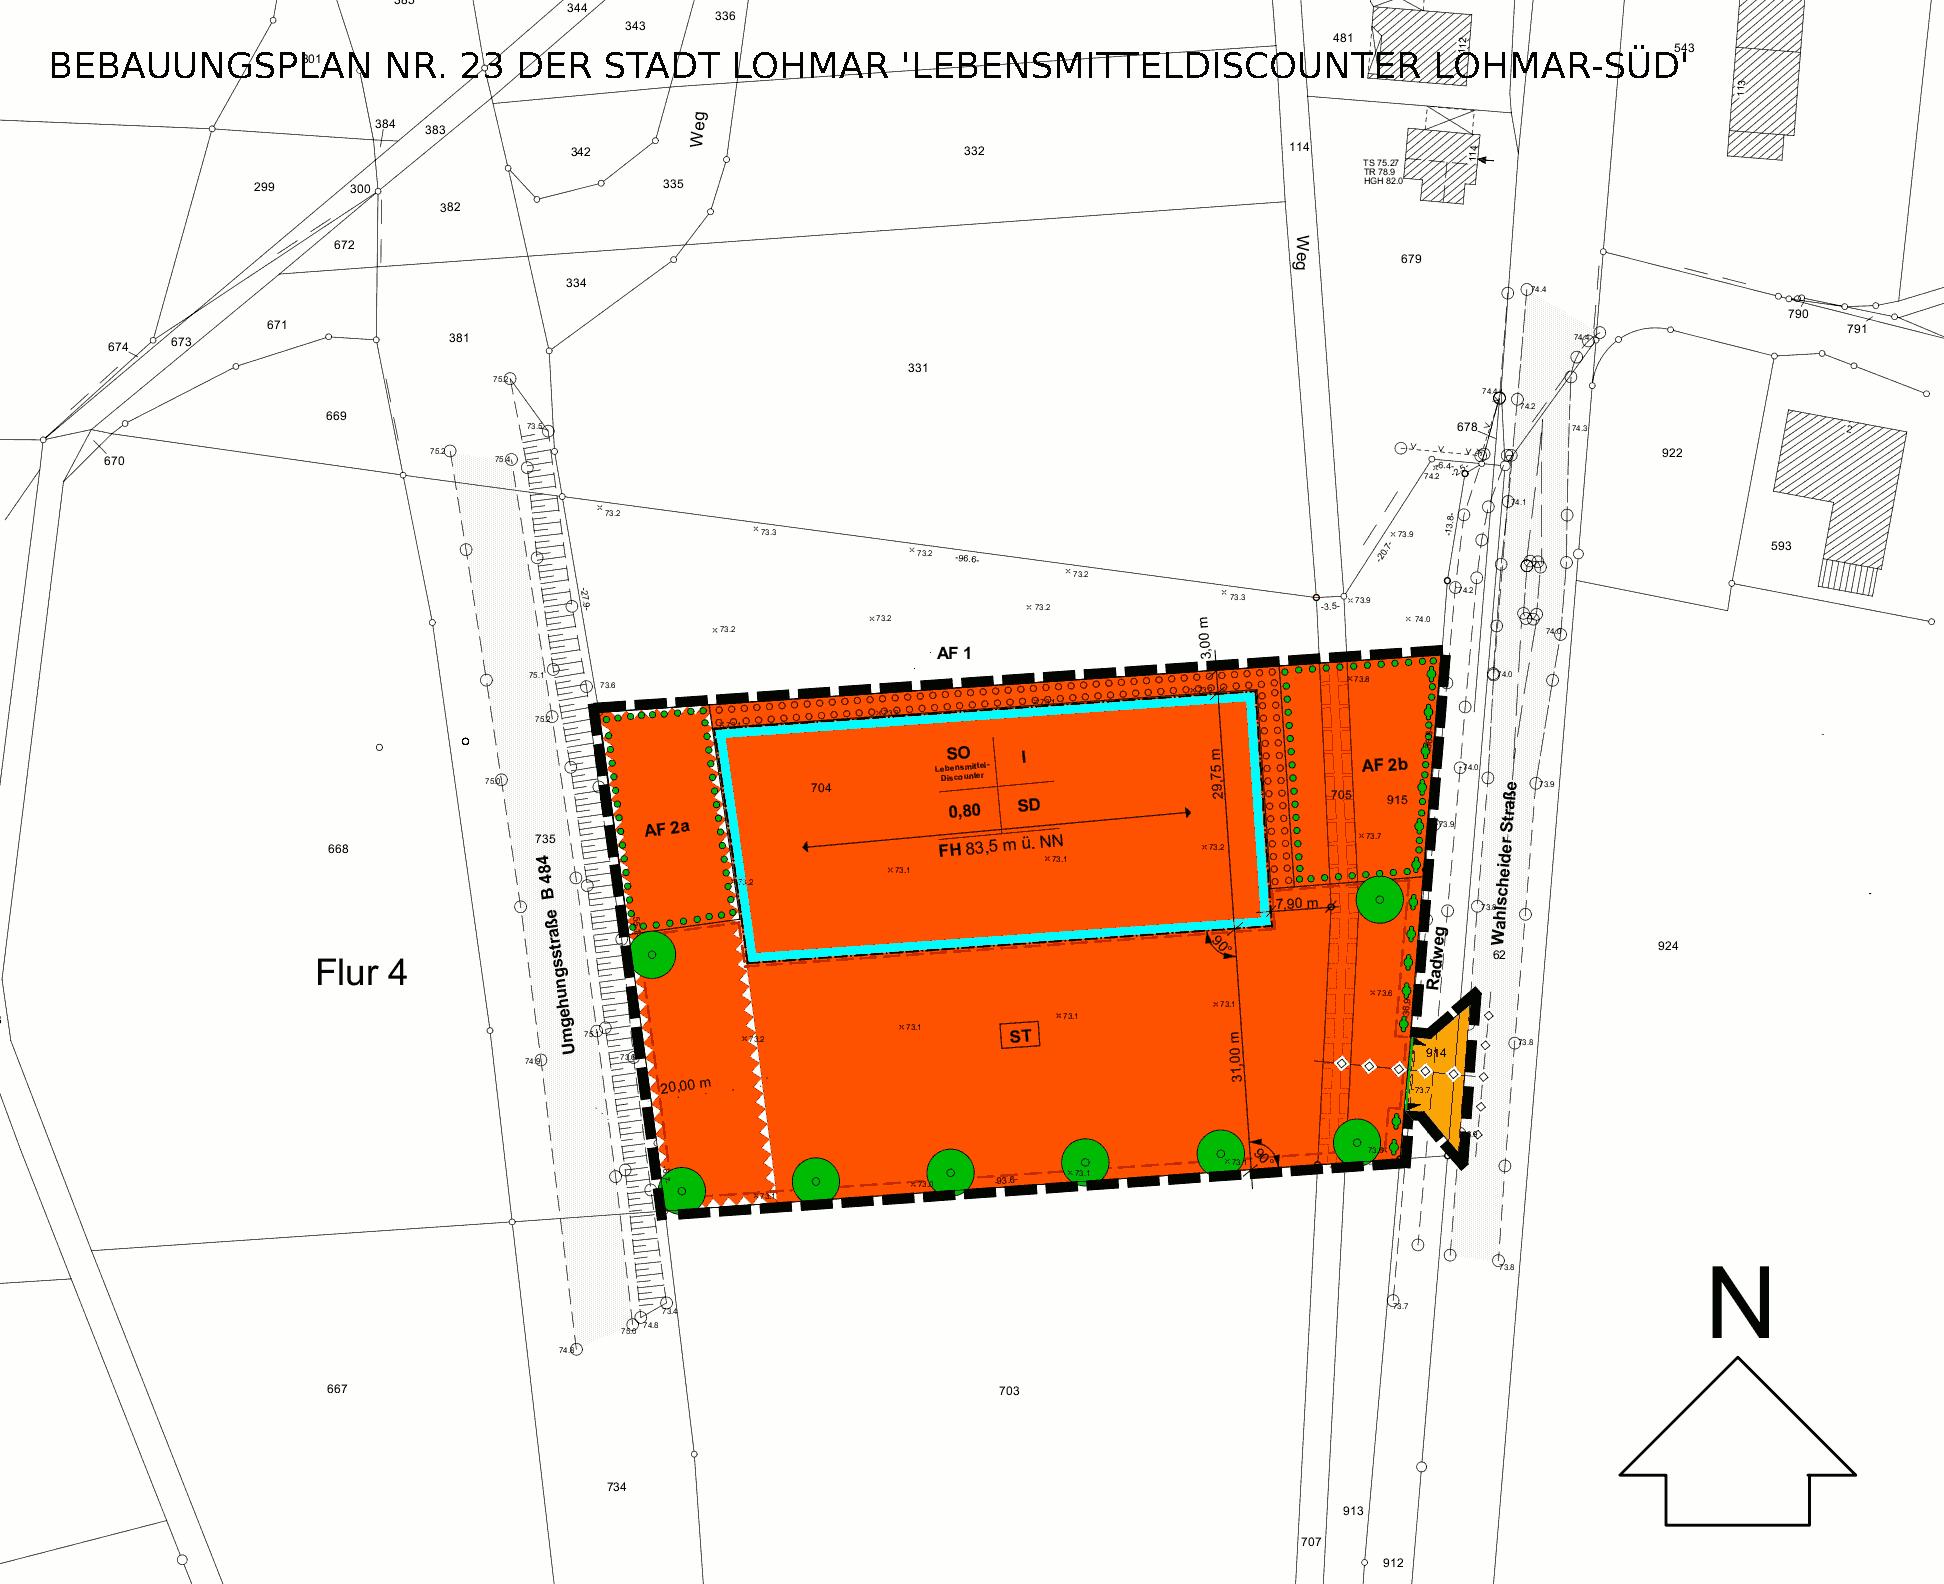 vorhabenbezogener bebauungsplan nr 23 der stadt lohmar 39 lebensmitteldiscounter lohmar s d. Black Bedroom Furniture Sets. Home Design Ideas